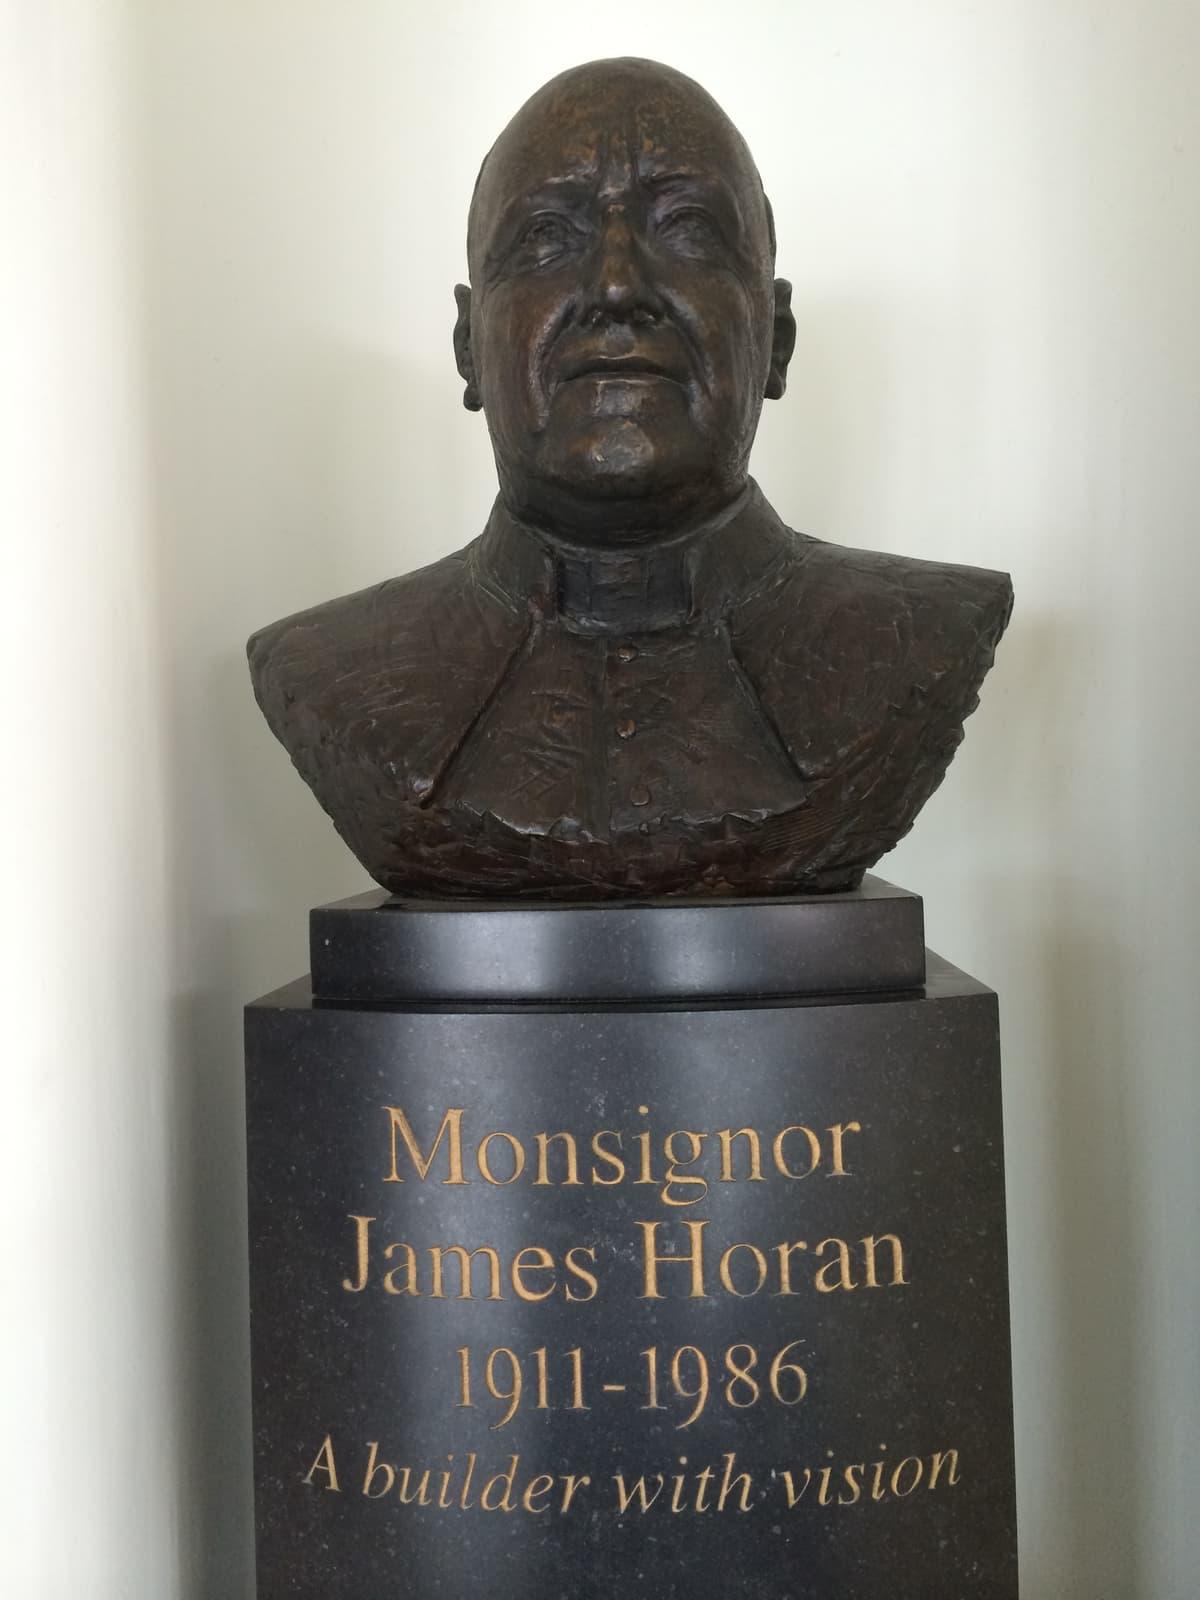 bronze statue of the head and shoulders Monsignor James Horan